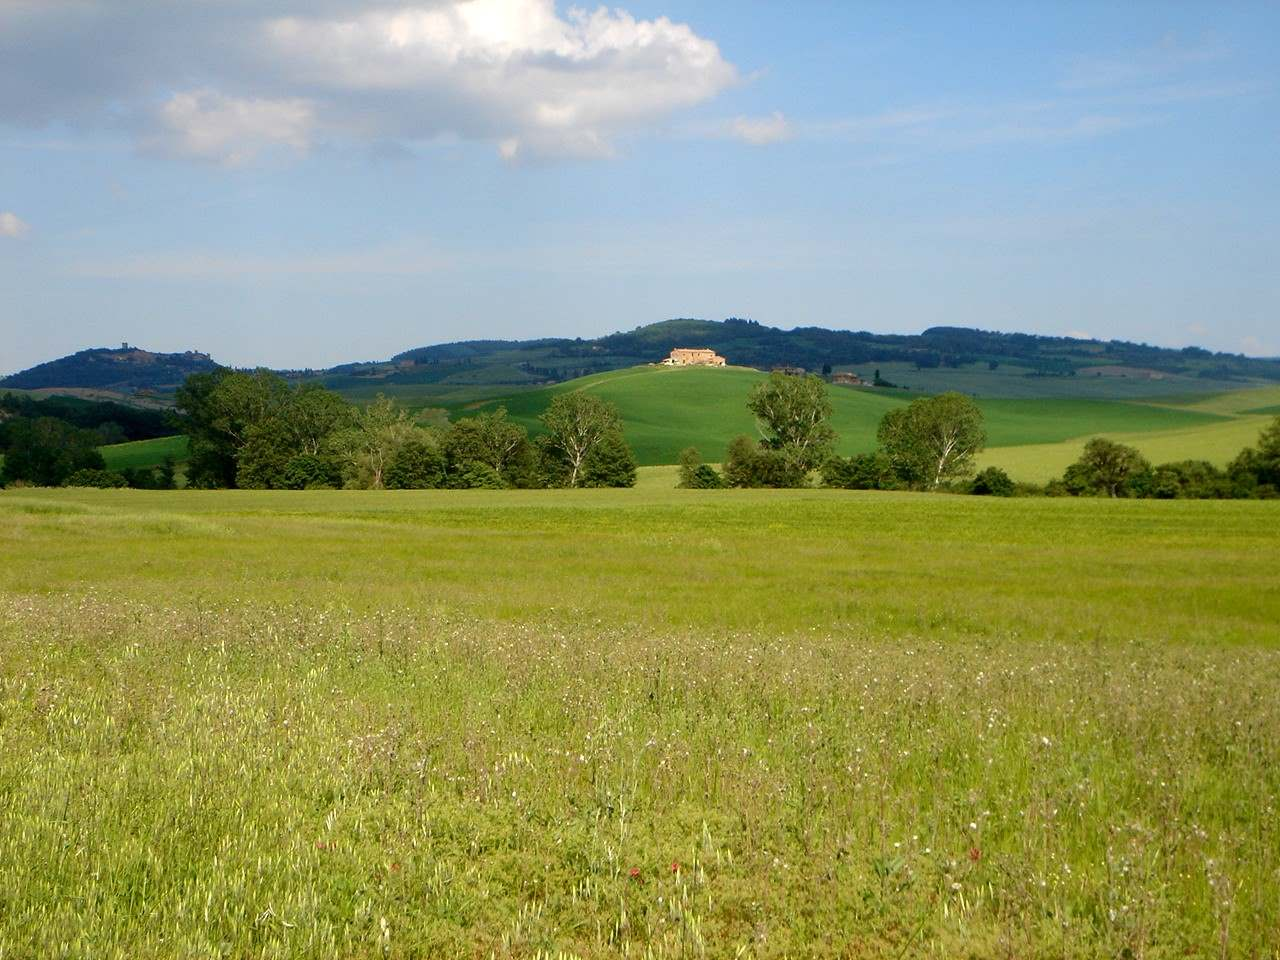 Foto: Manfred Karl / Mountainbike Tour / Von Bagno Vignoni nach Pienza / Rückweg nach Bagno / 20.06.2007 17:44:15